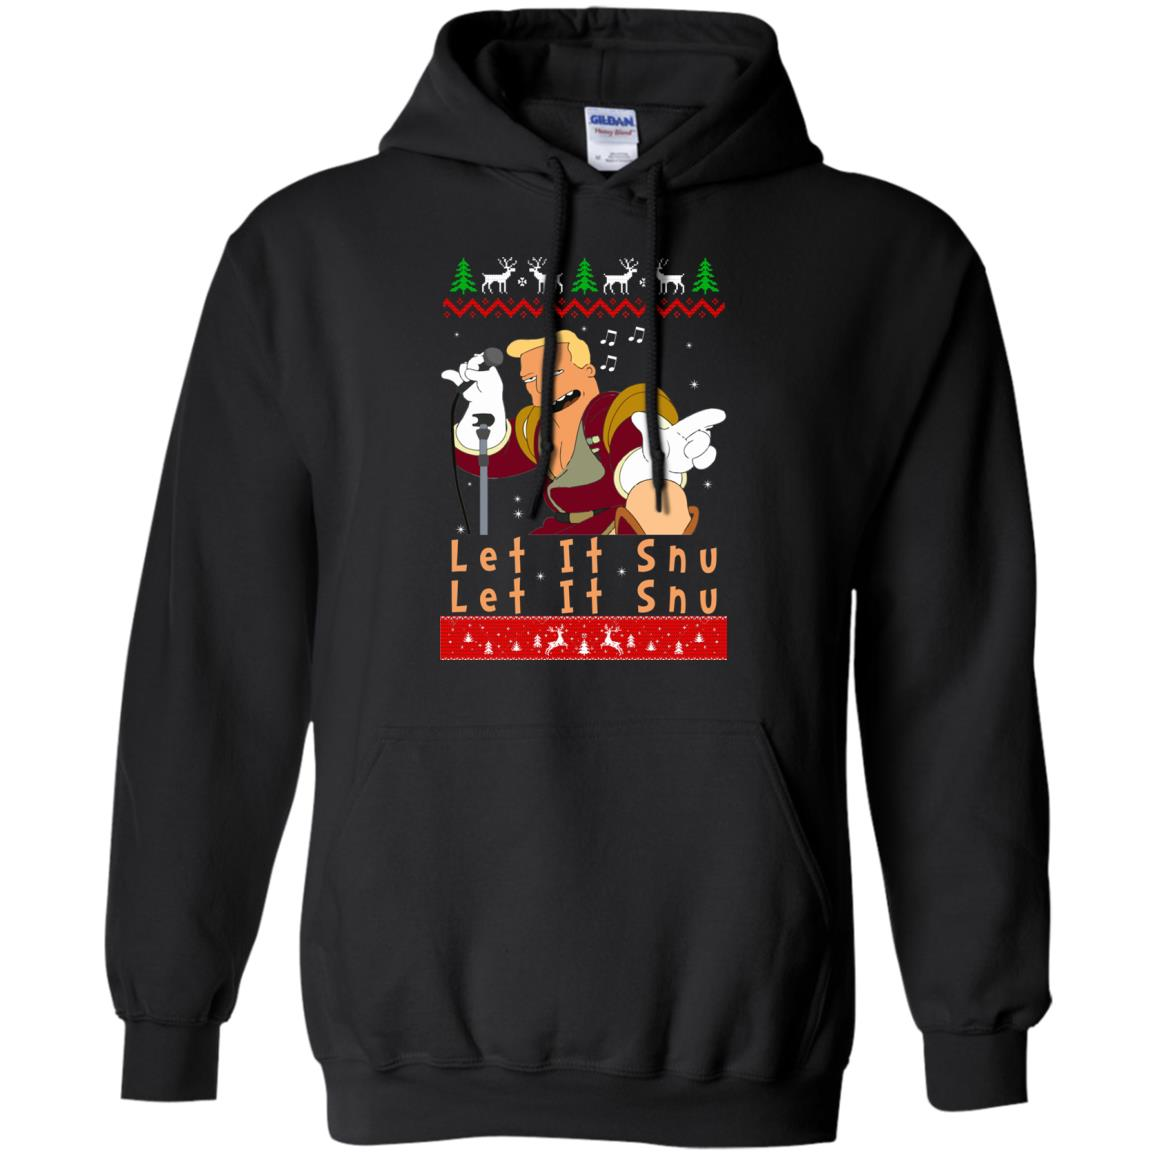 image 715 - Zapp Brannigan Let It Snu Christmas Sweatshirt, Hoodie